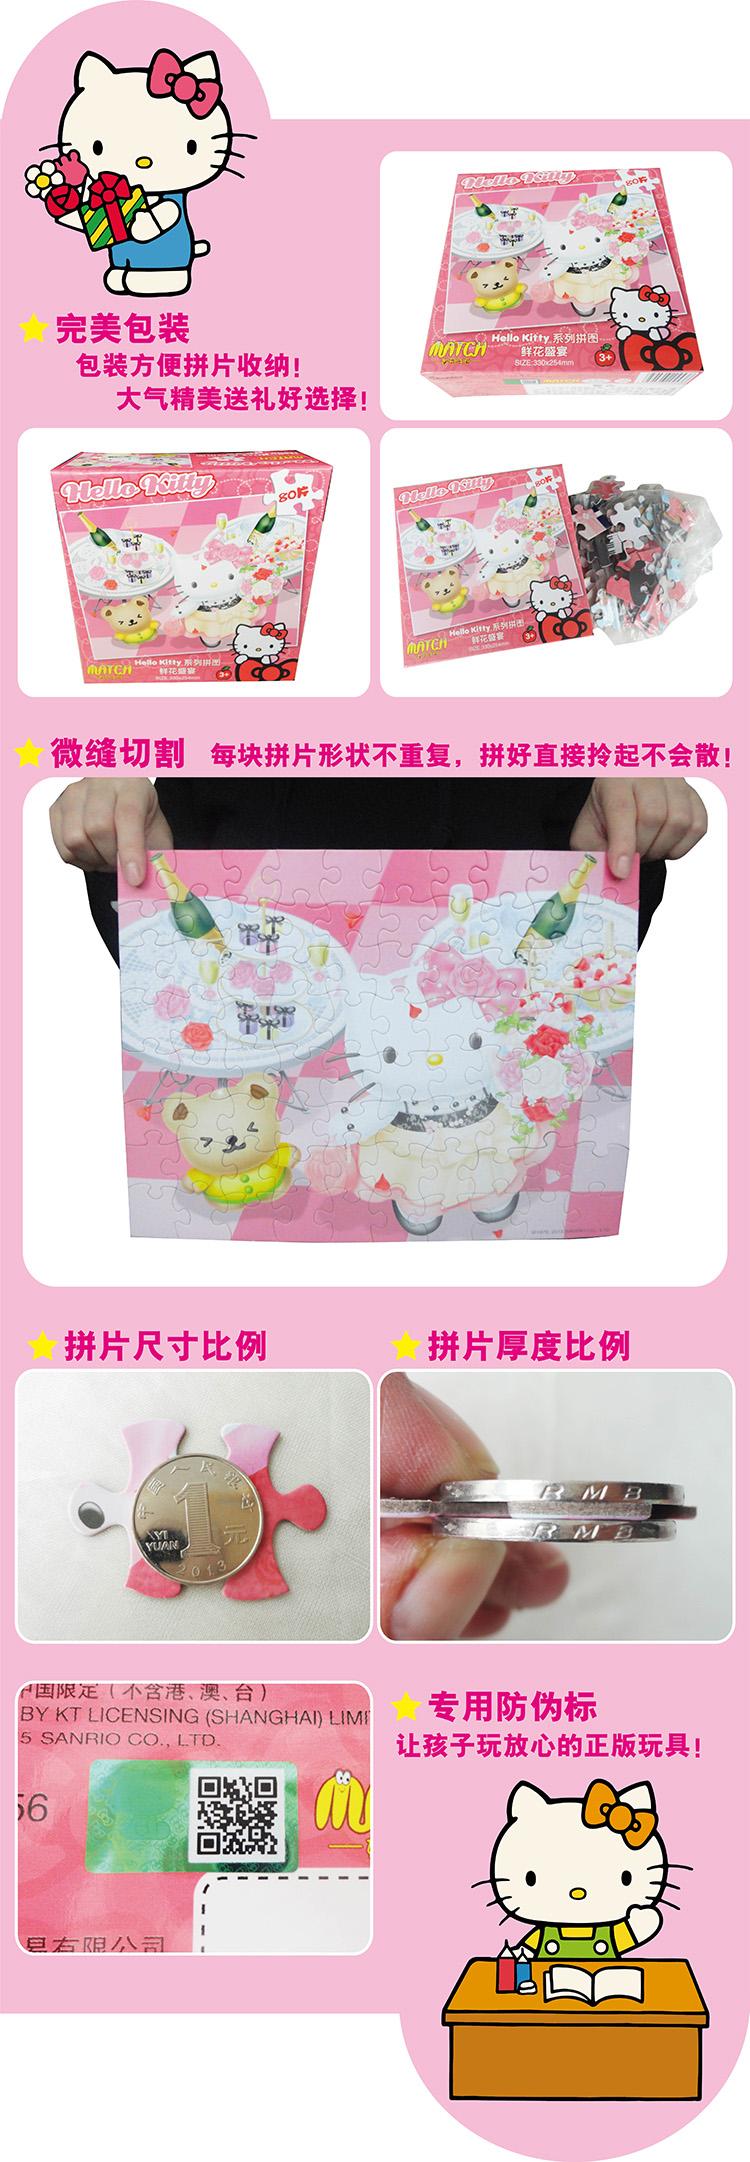 Hello Kitty 儿童拼图 拼插玩具手眼脑协调的锻炼工具 盒装平面拼图纸质80片好不好